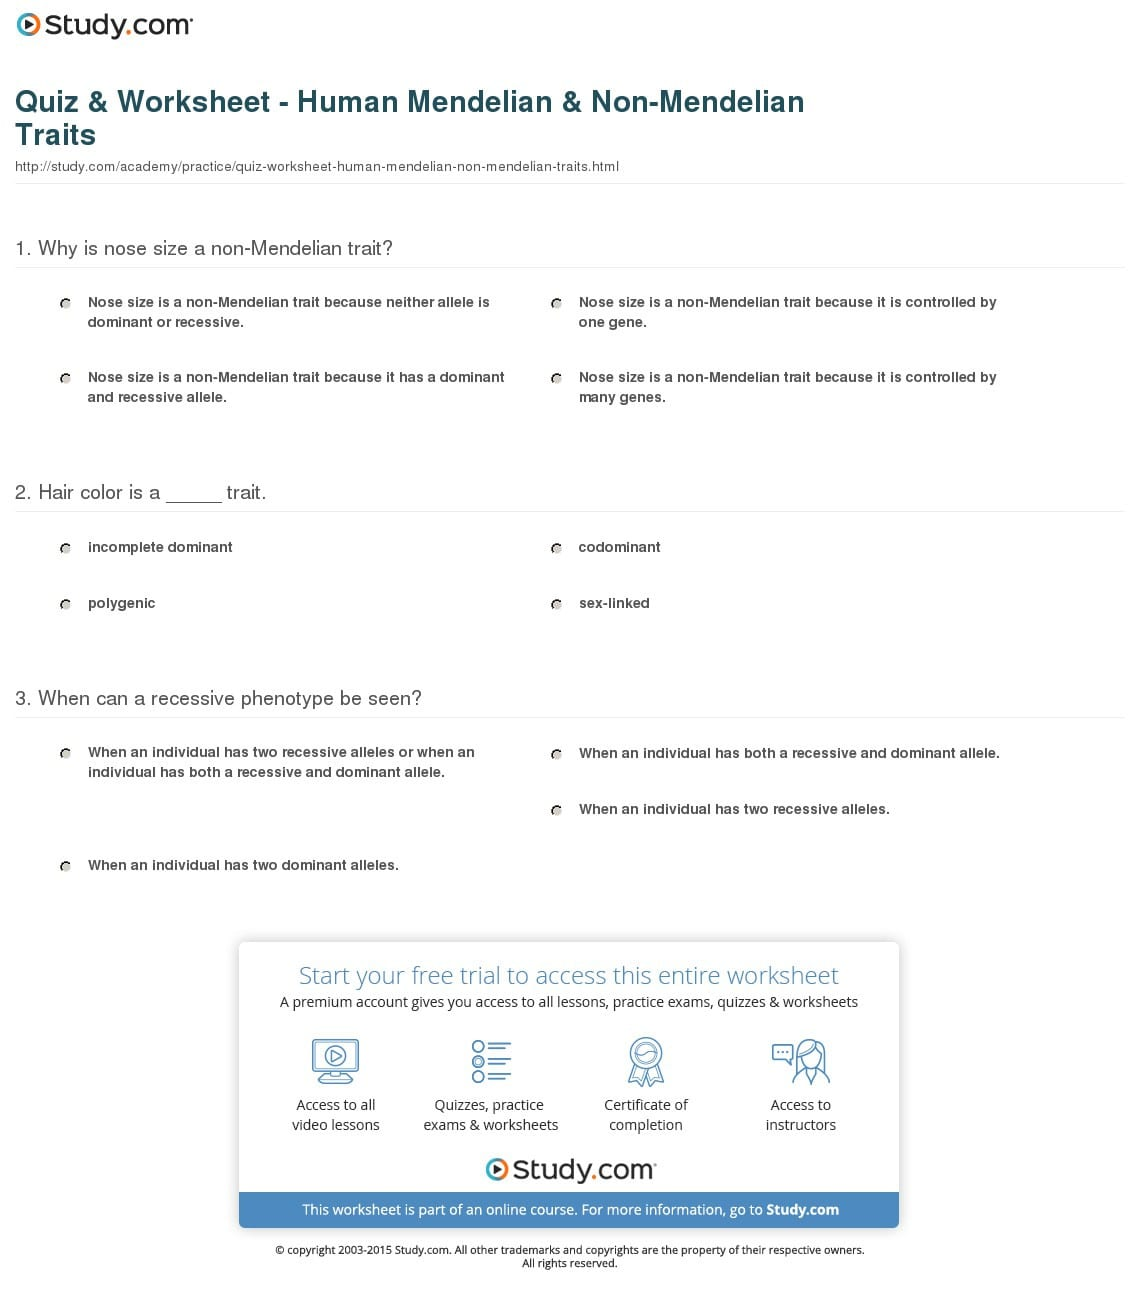 Quiz Worksheet Human Mendelian Nonmendelian Traits